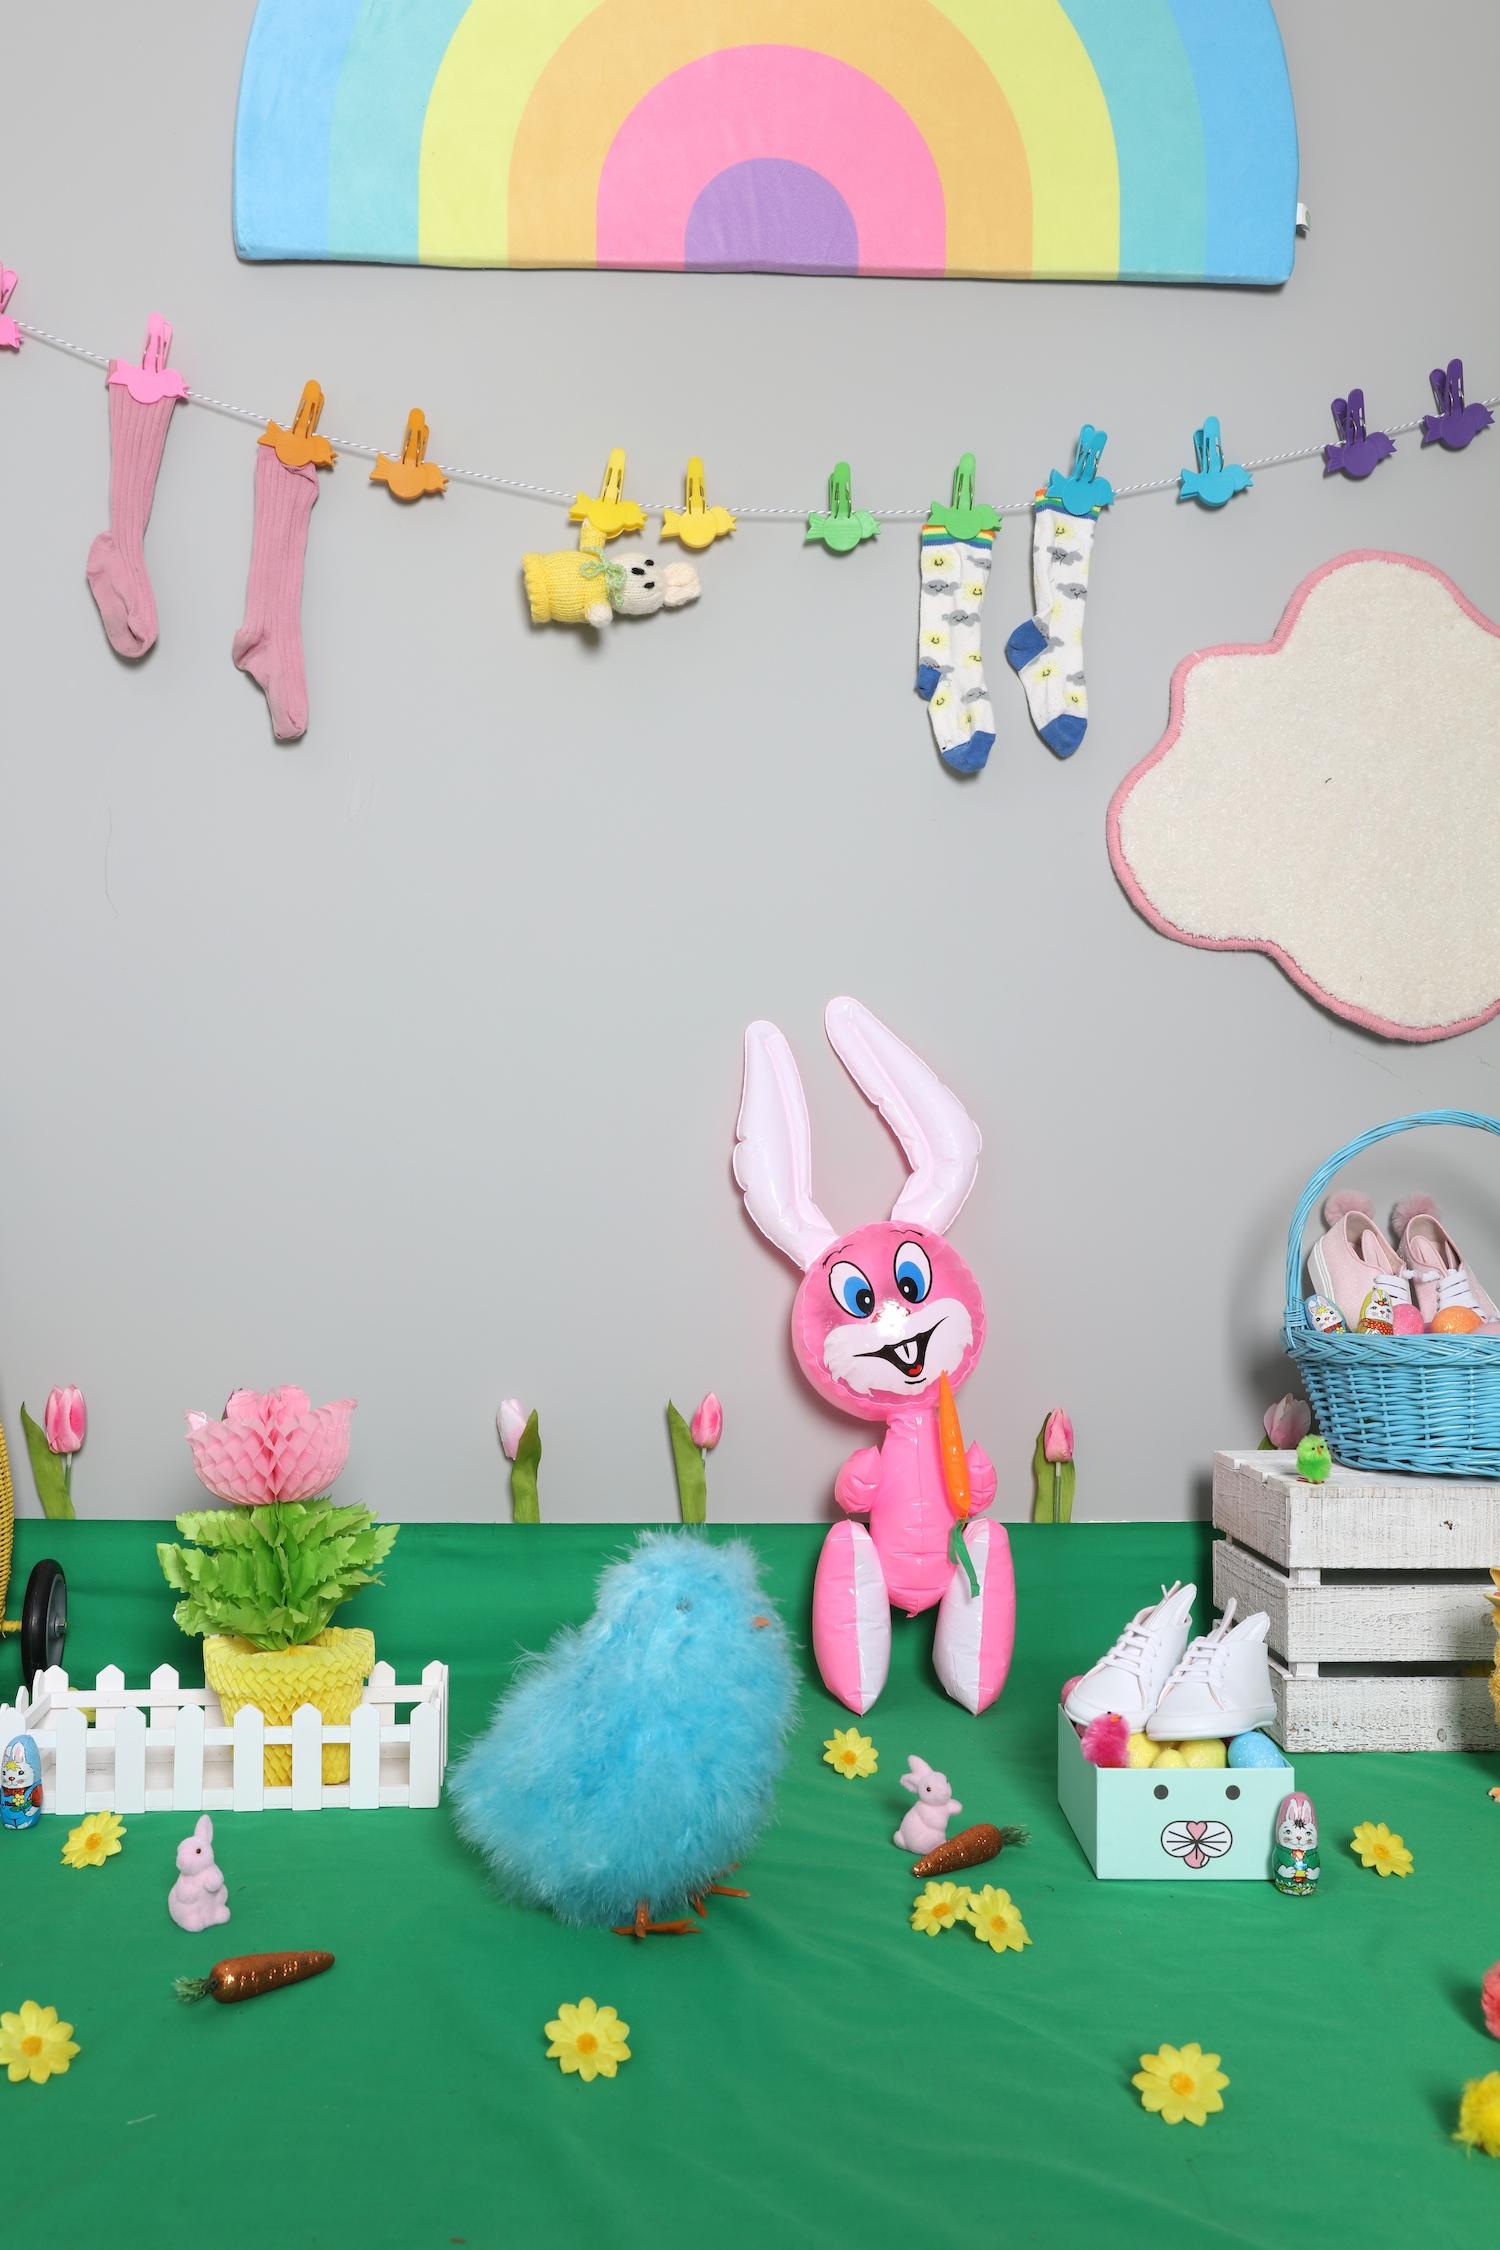 minna_parikka_mini_bunny_trainers_shoes